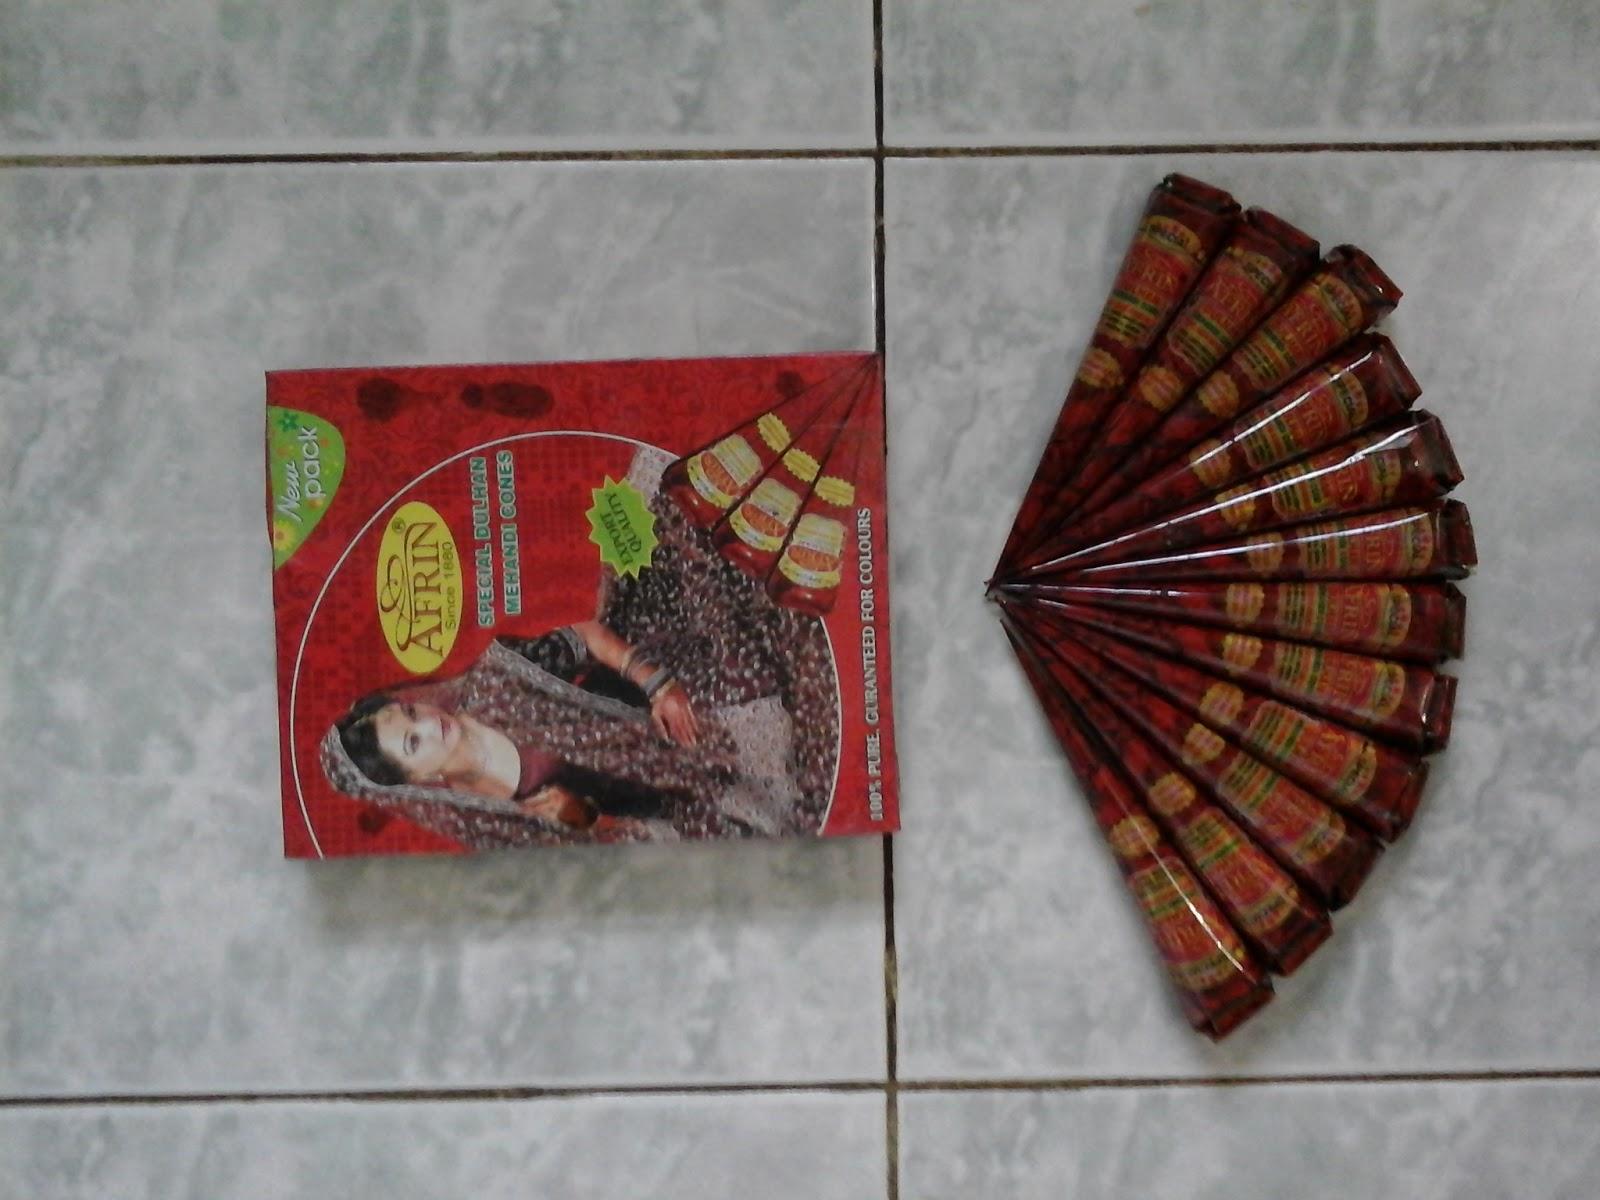 HENNA GOLECHA INDONESIA Oktober 2015